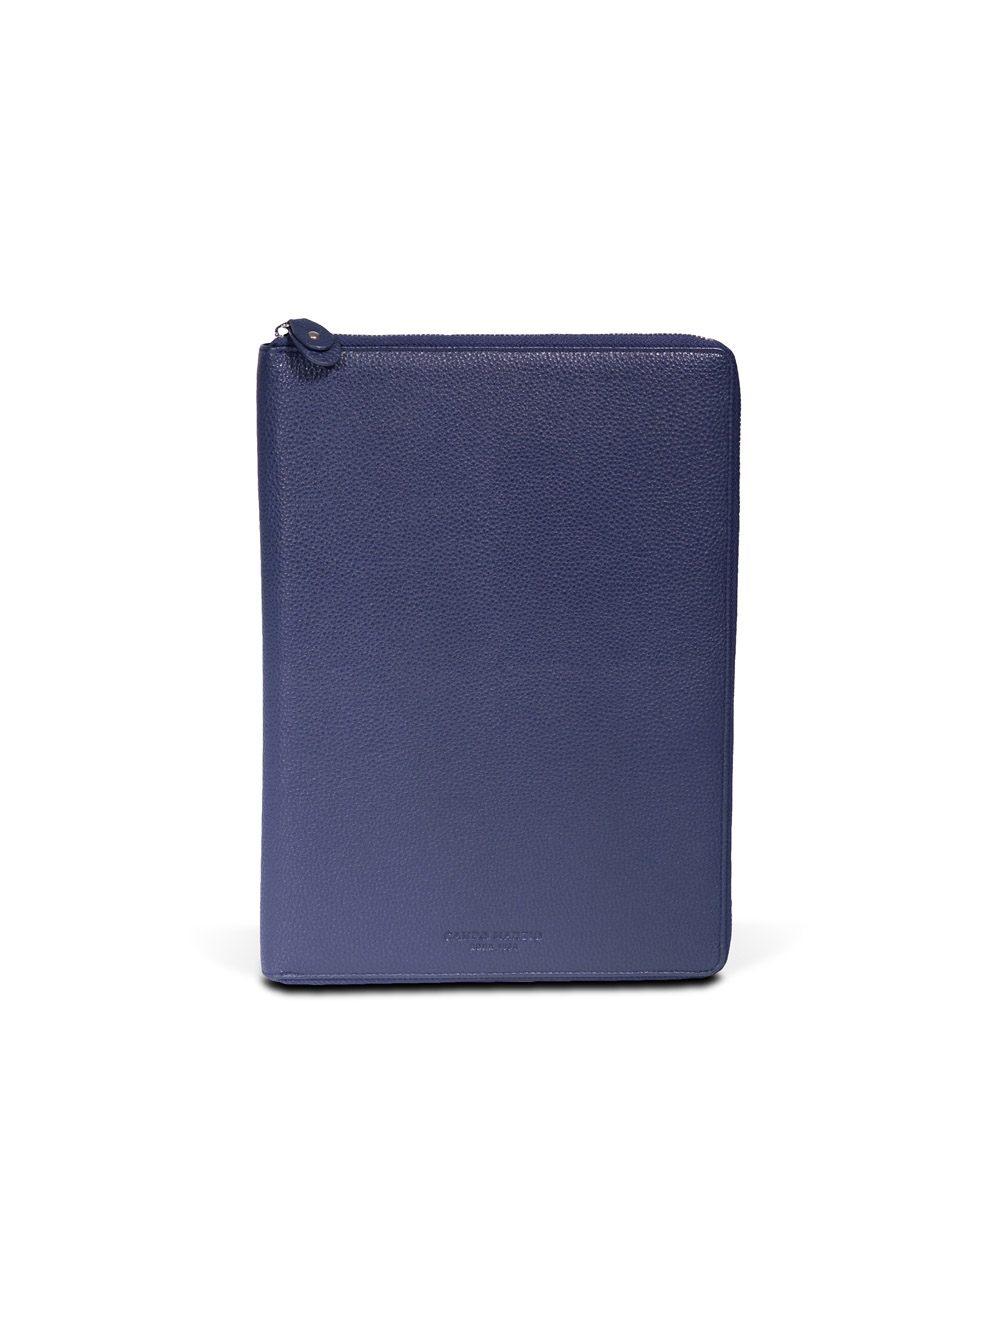 Portfolio Zip A4 - Ocean Blue